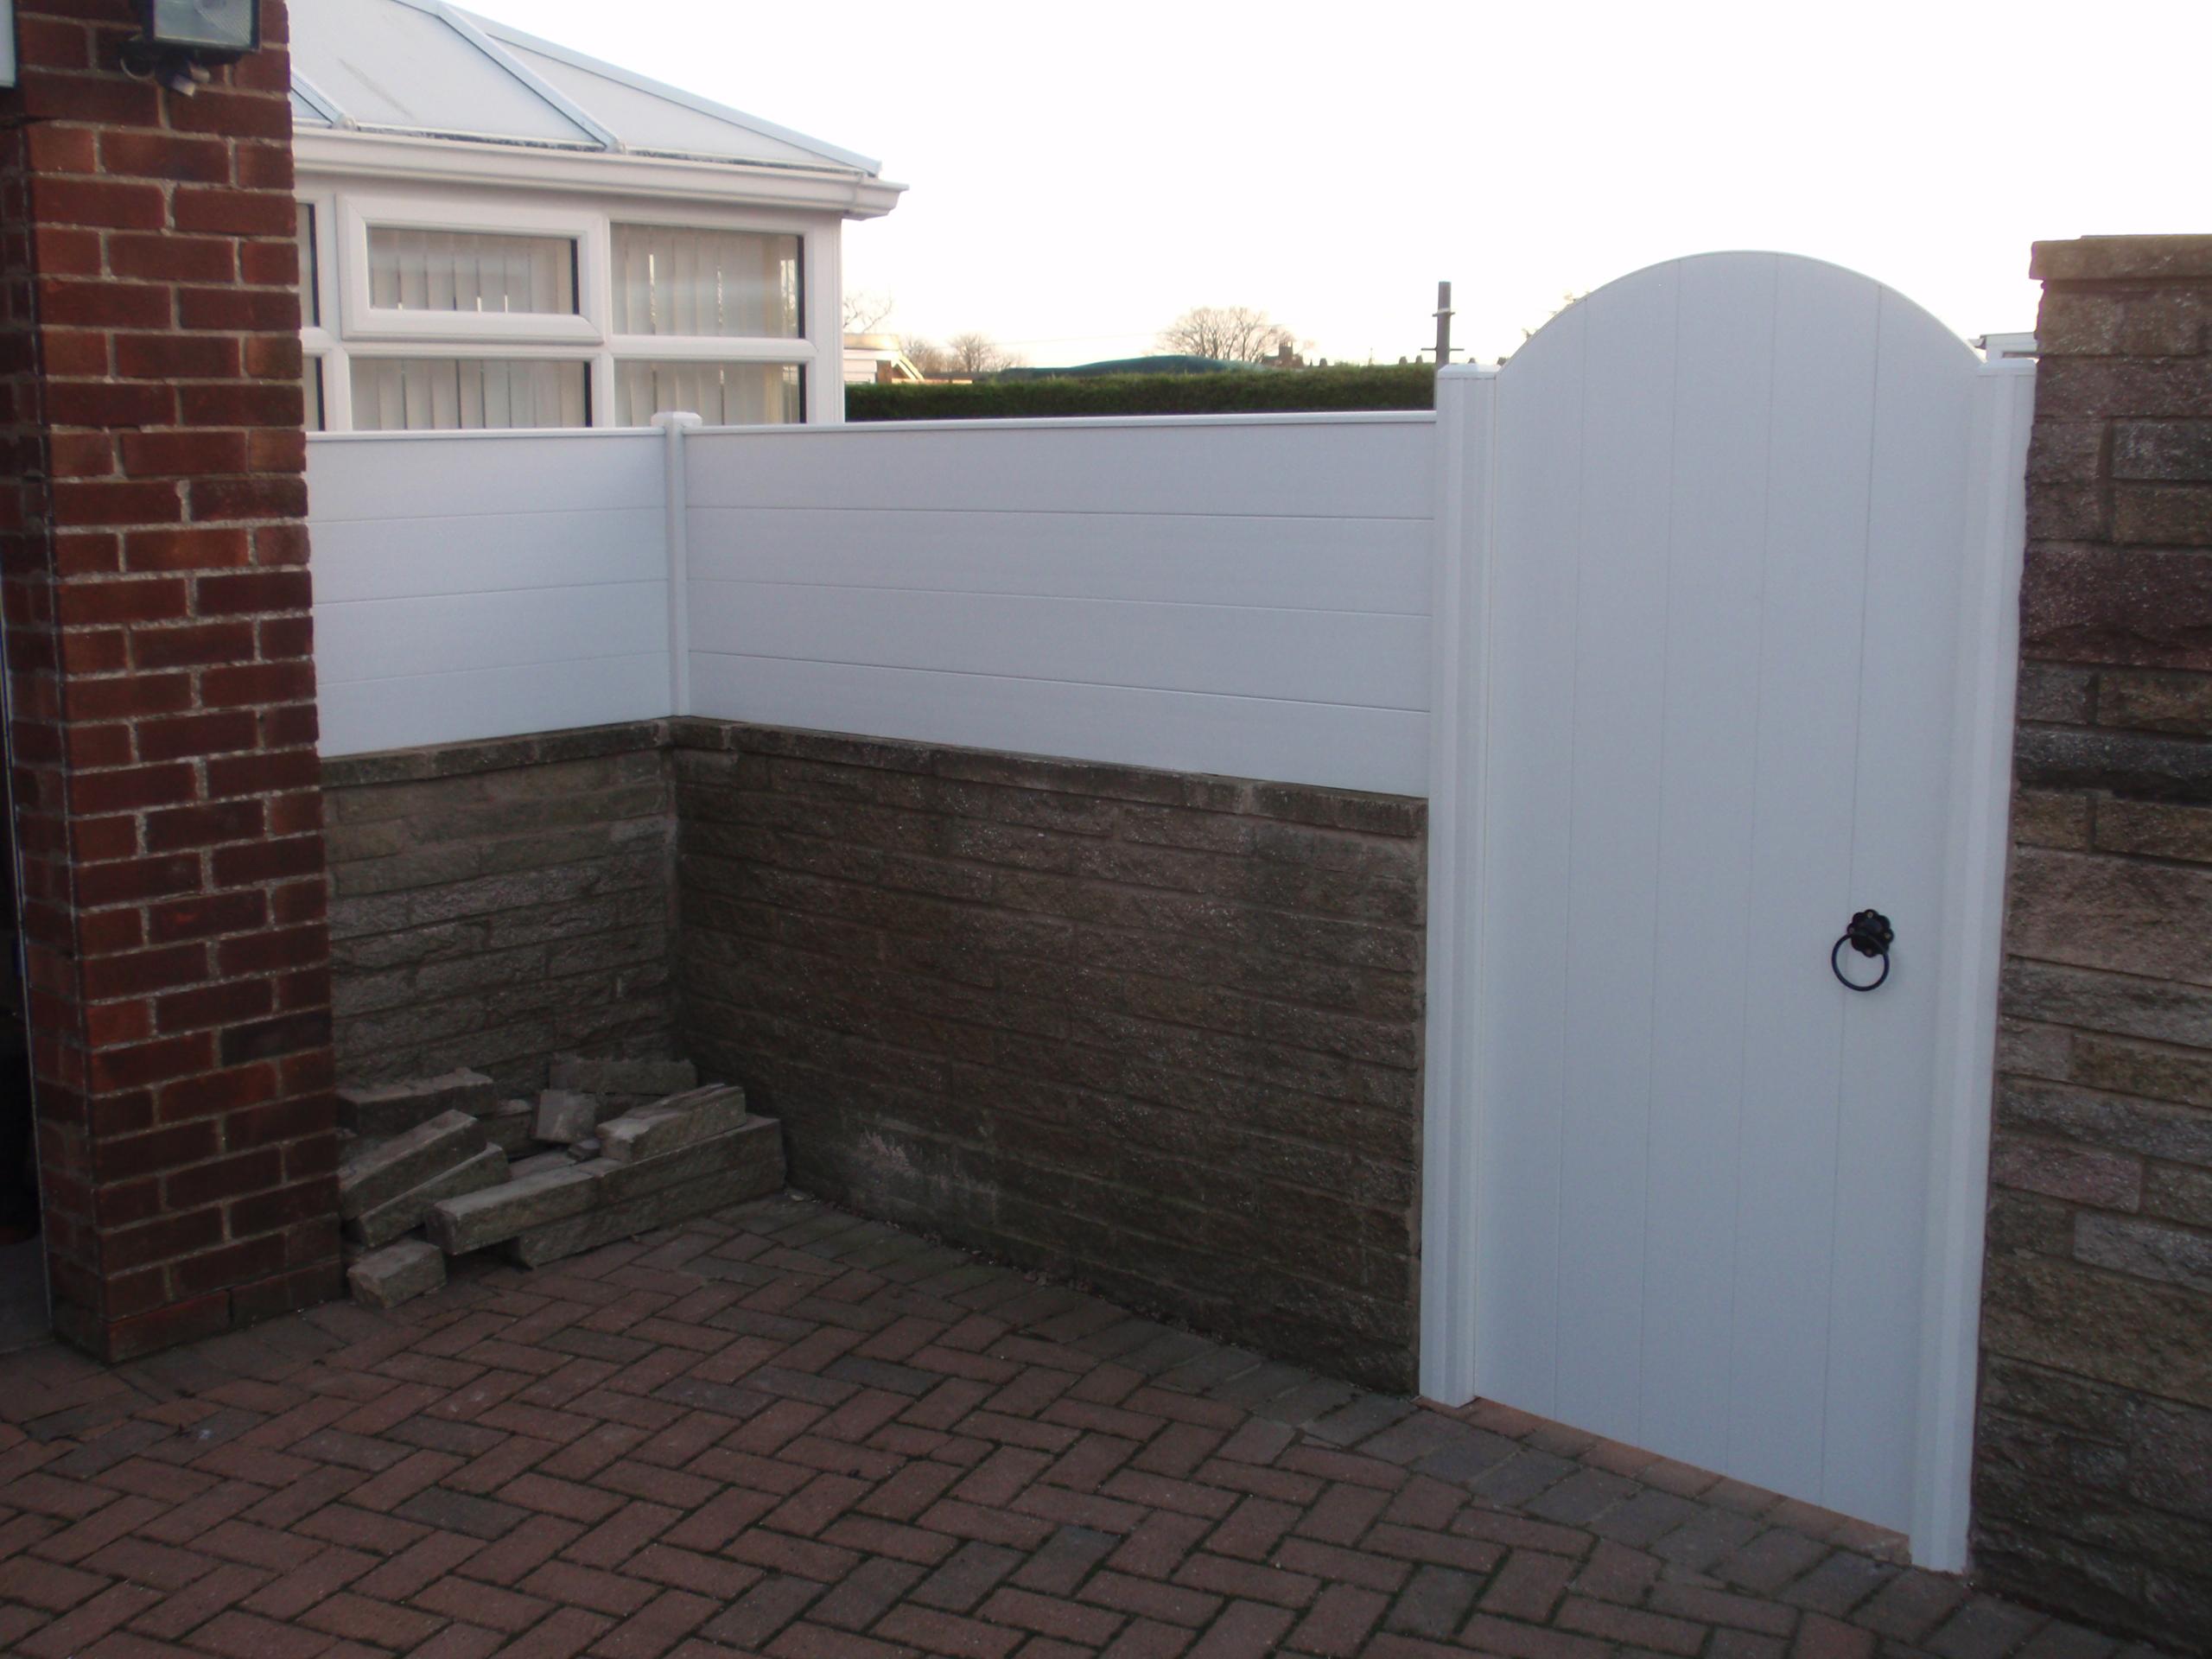 Pvc Gates Arch Top Gate Plastic Gates Pvc Gates And